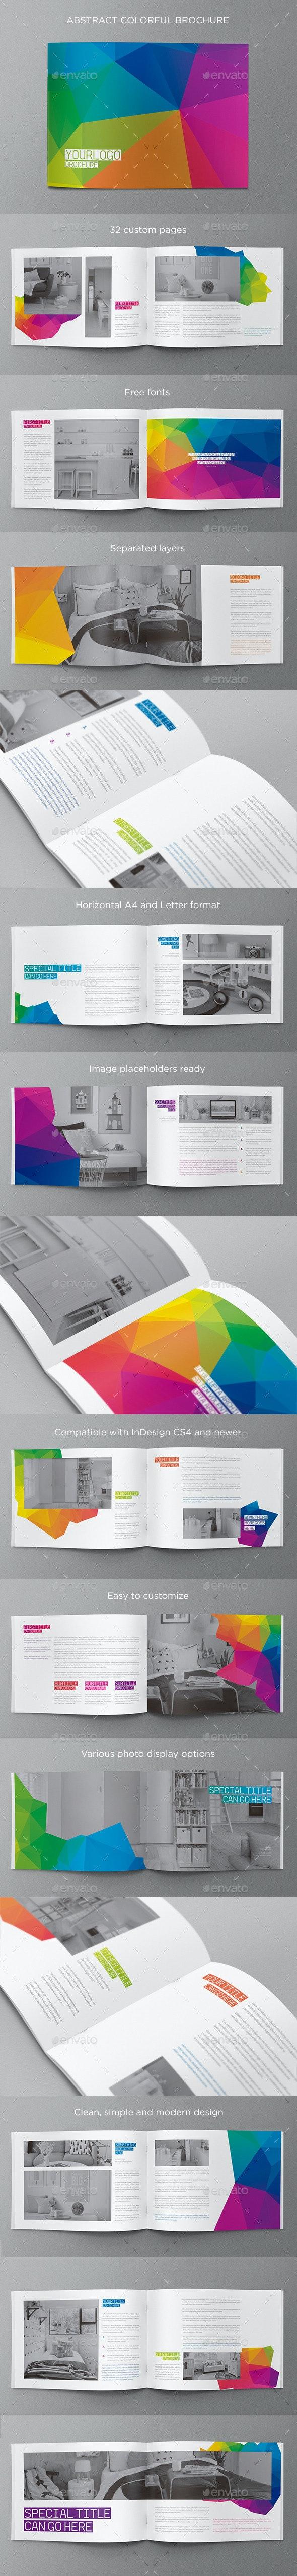 Abstract Modern Brochure - Brochures Print Templates